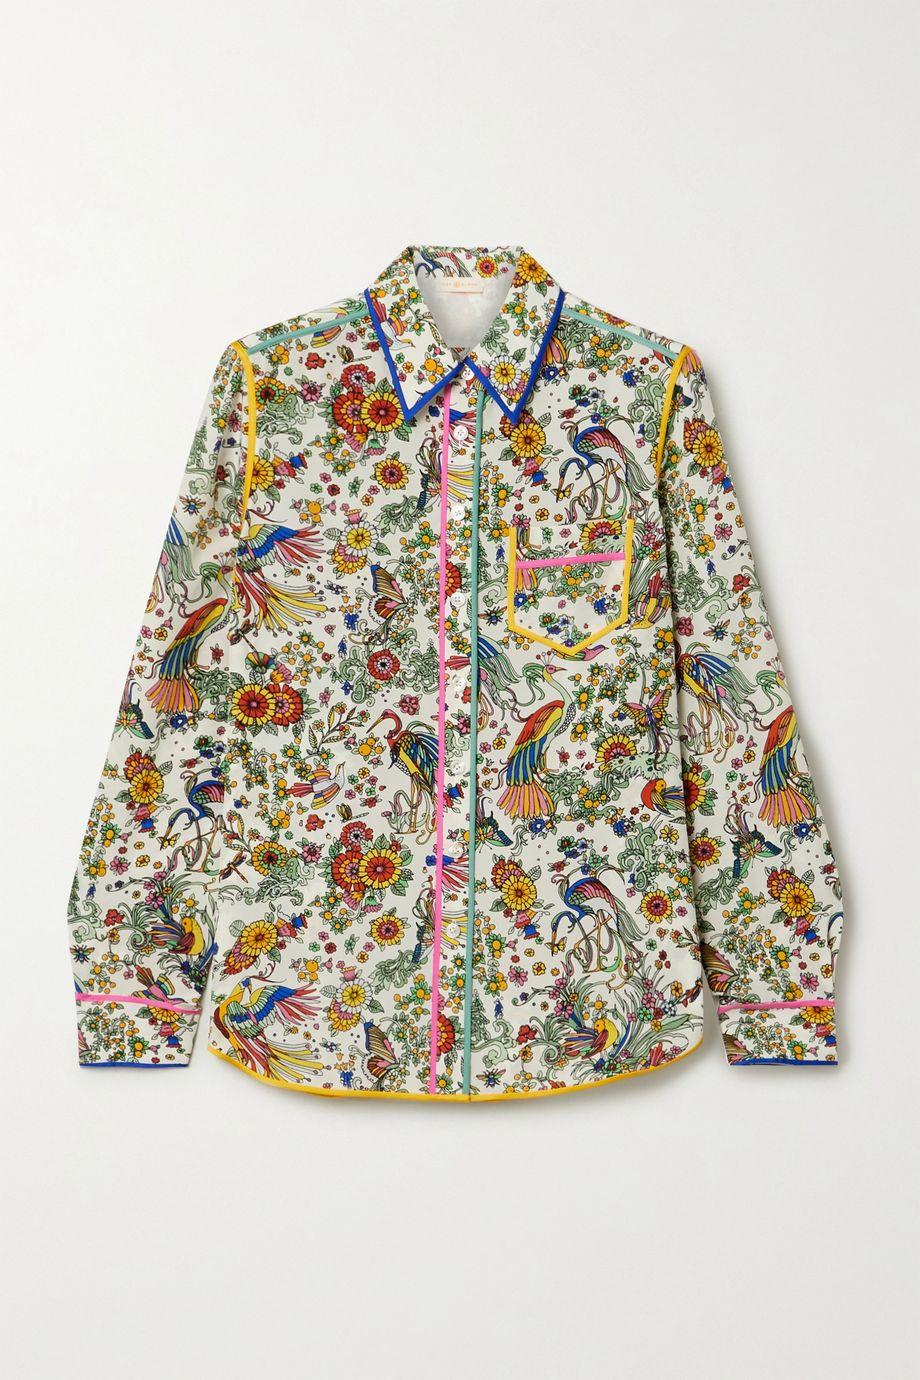 Tory Burch Piped printed silk crepe de chine shirt